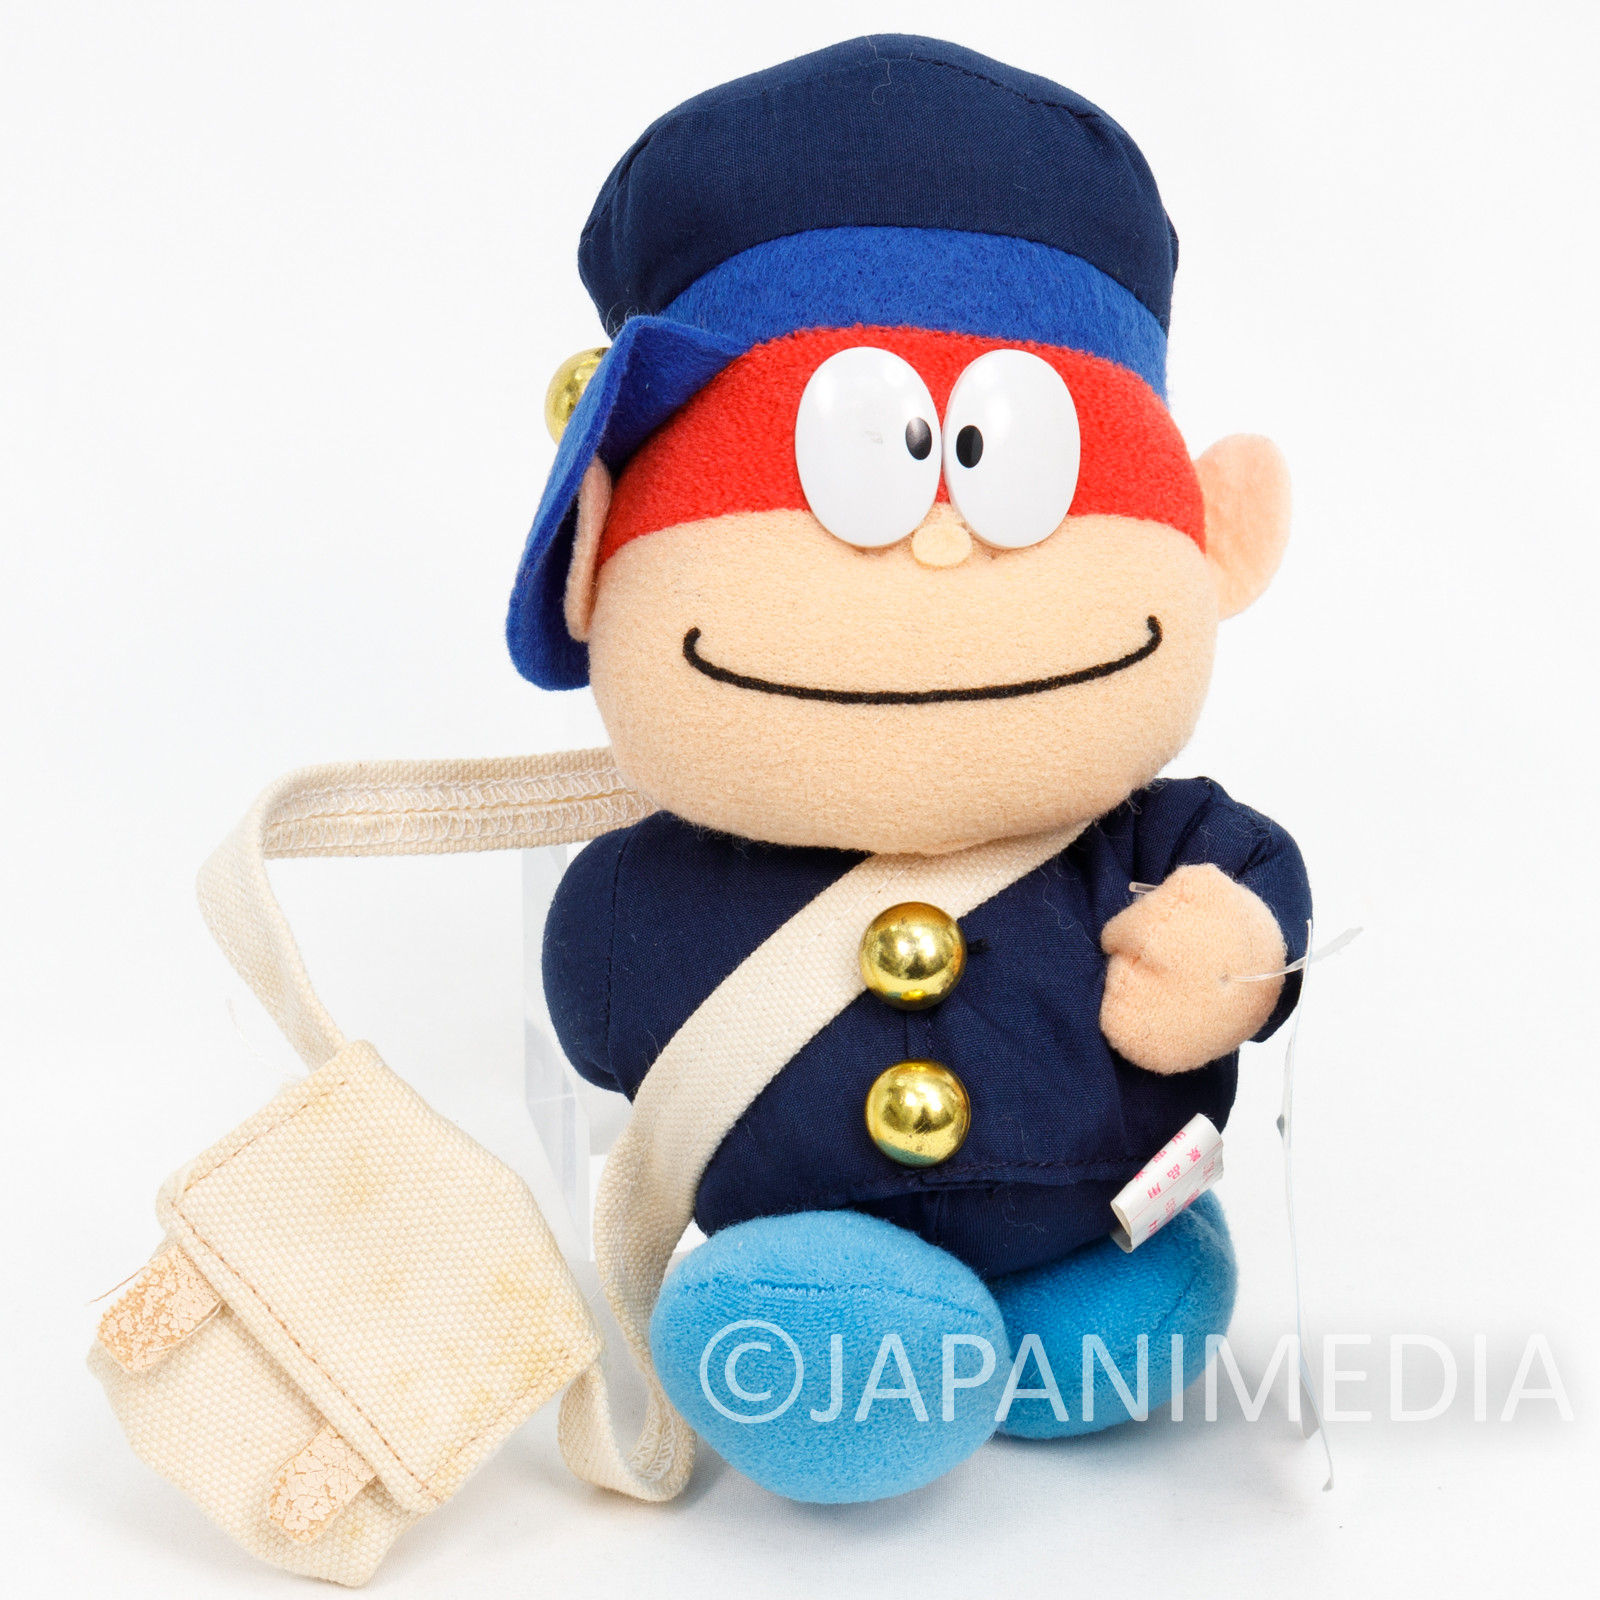 Retro Dokonjo Gaeru Goro Gorou Plush Doll Banpresto JAPAN ANIME